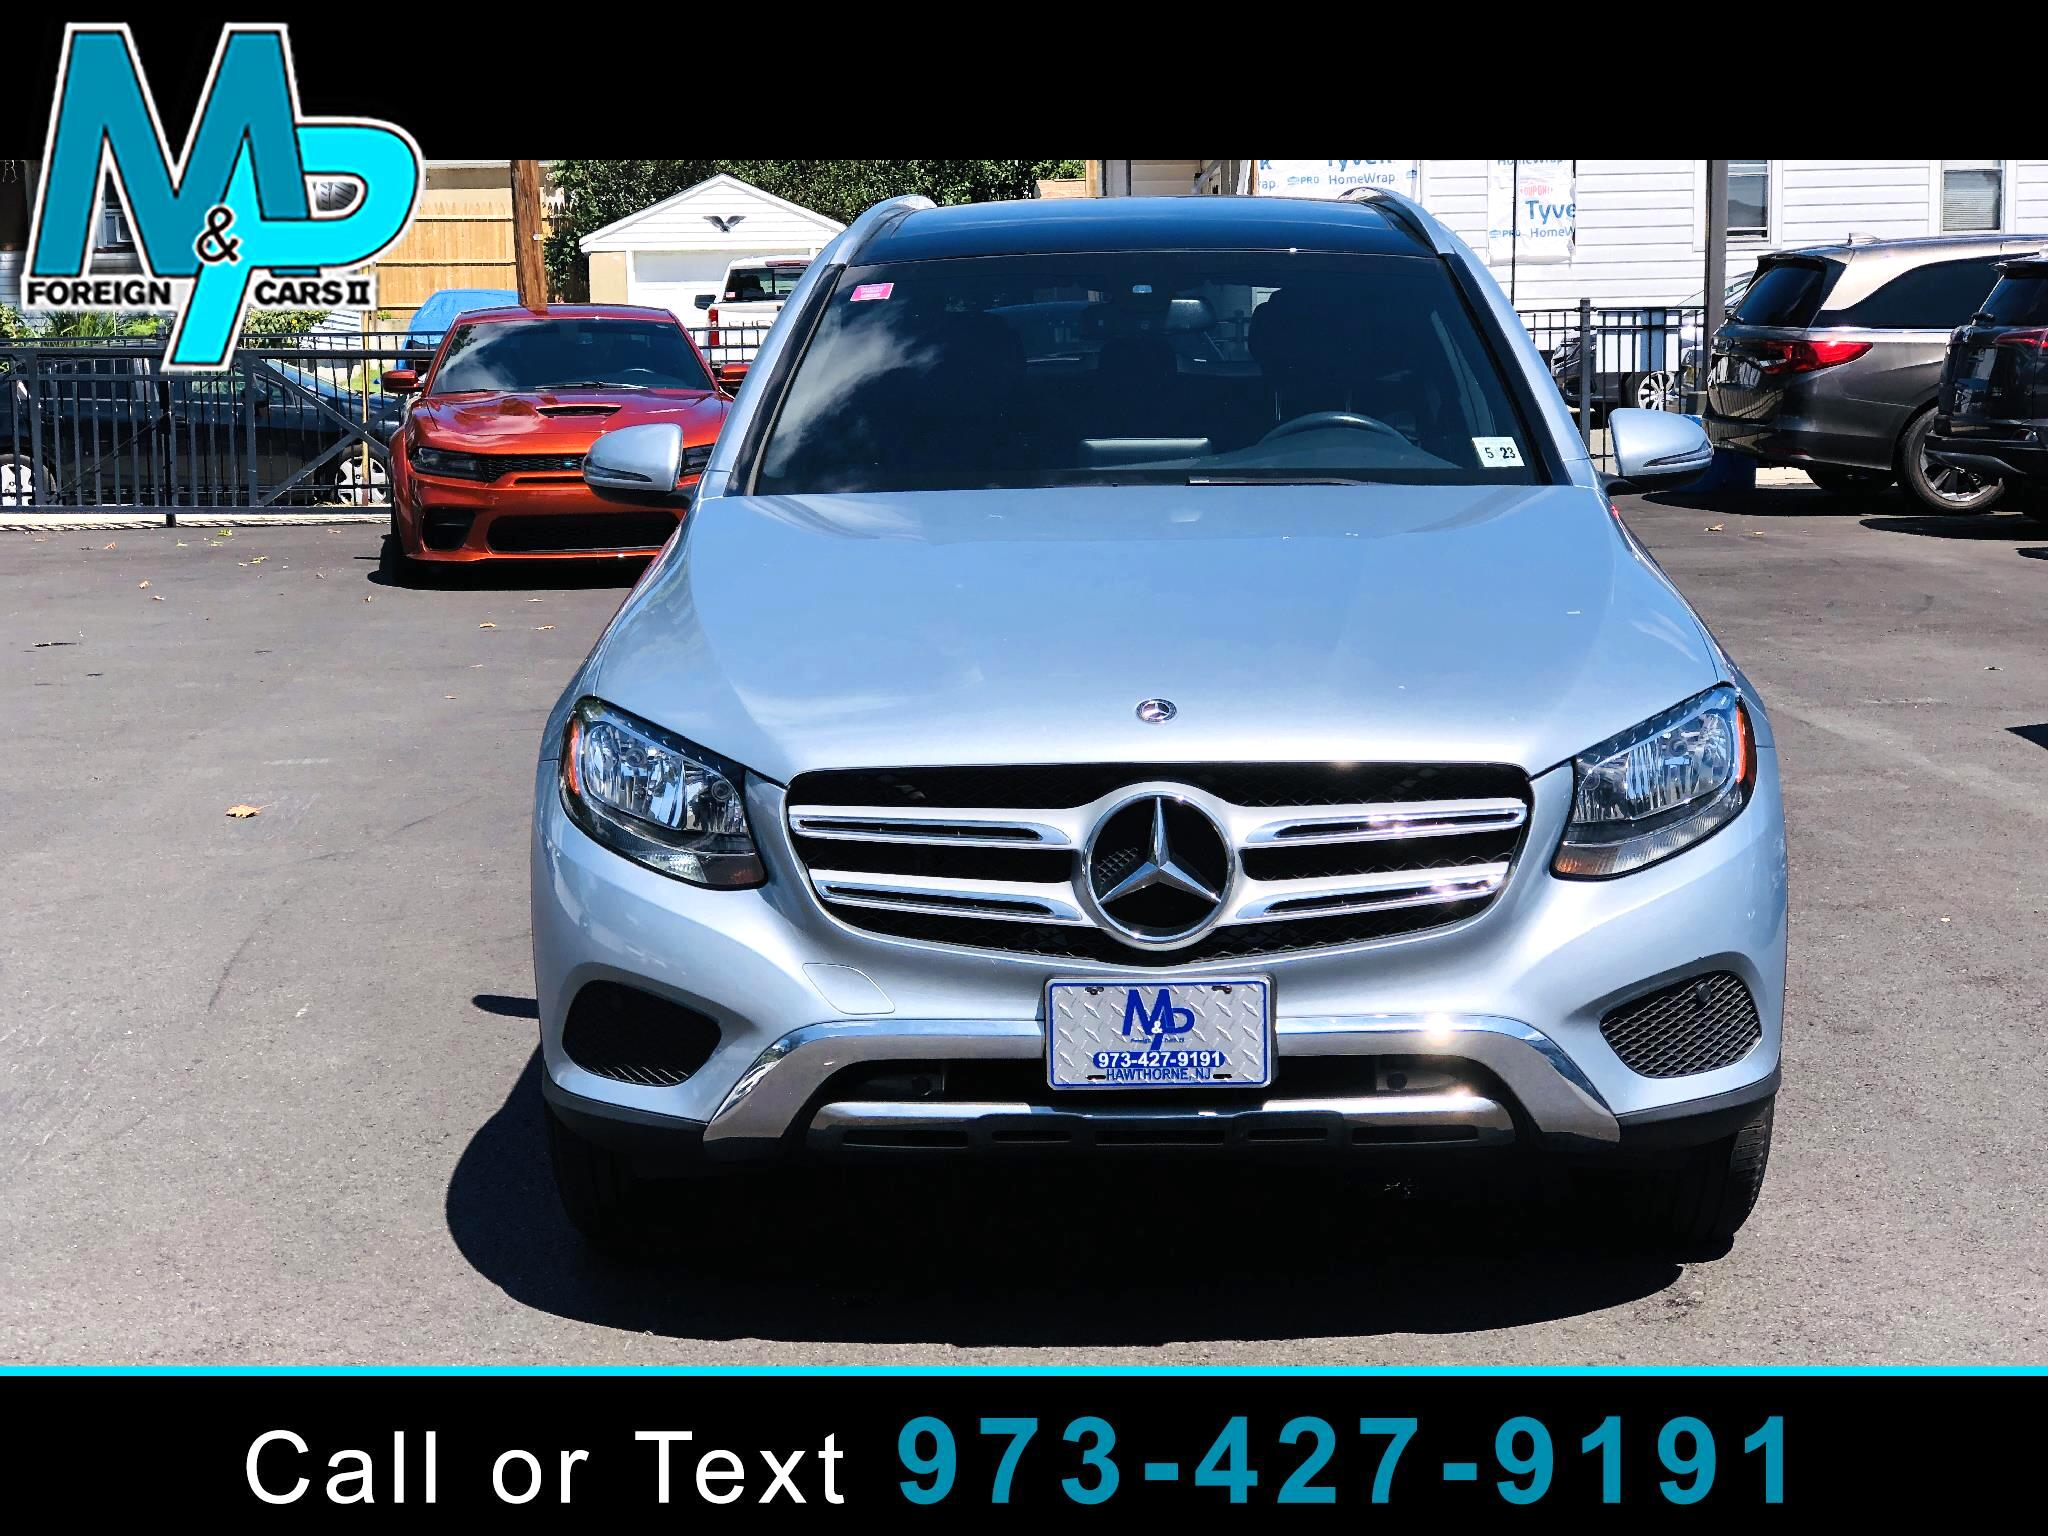 Mercedes-Benz GLC GLC 300 4MATIC SUV 2018